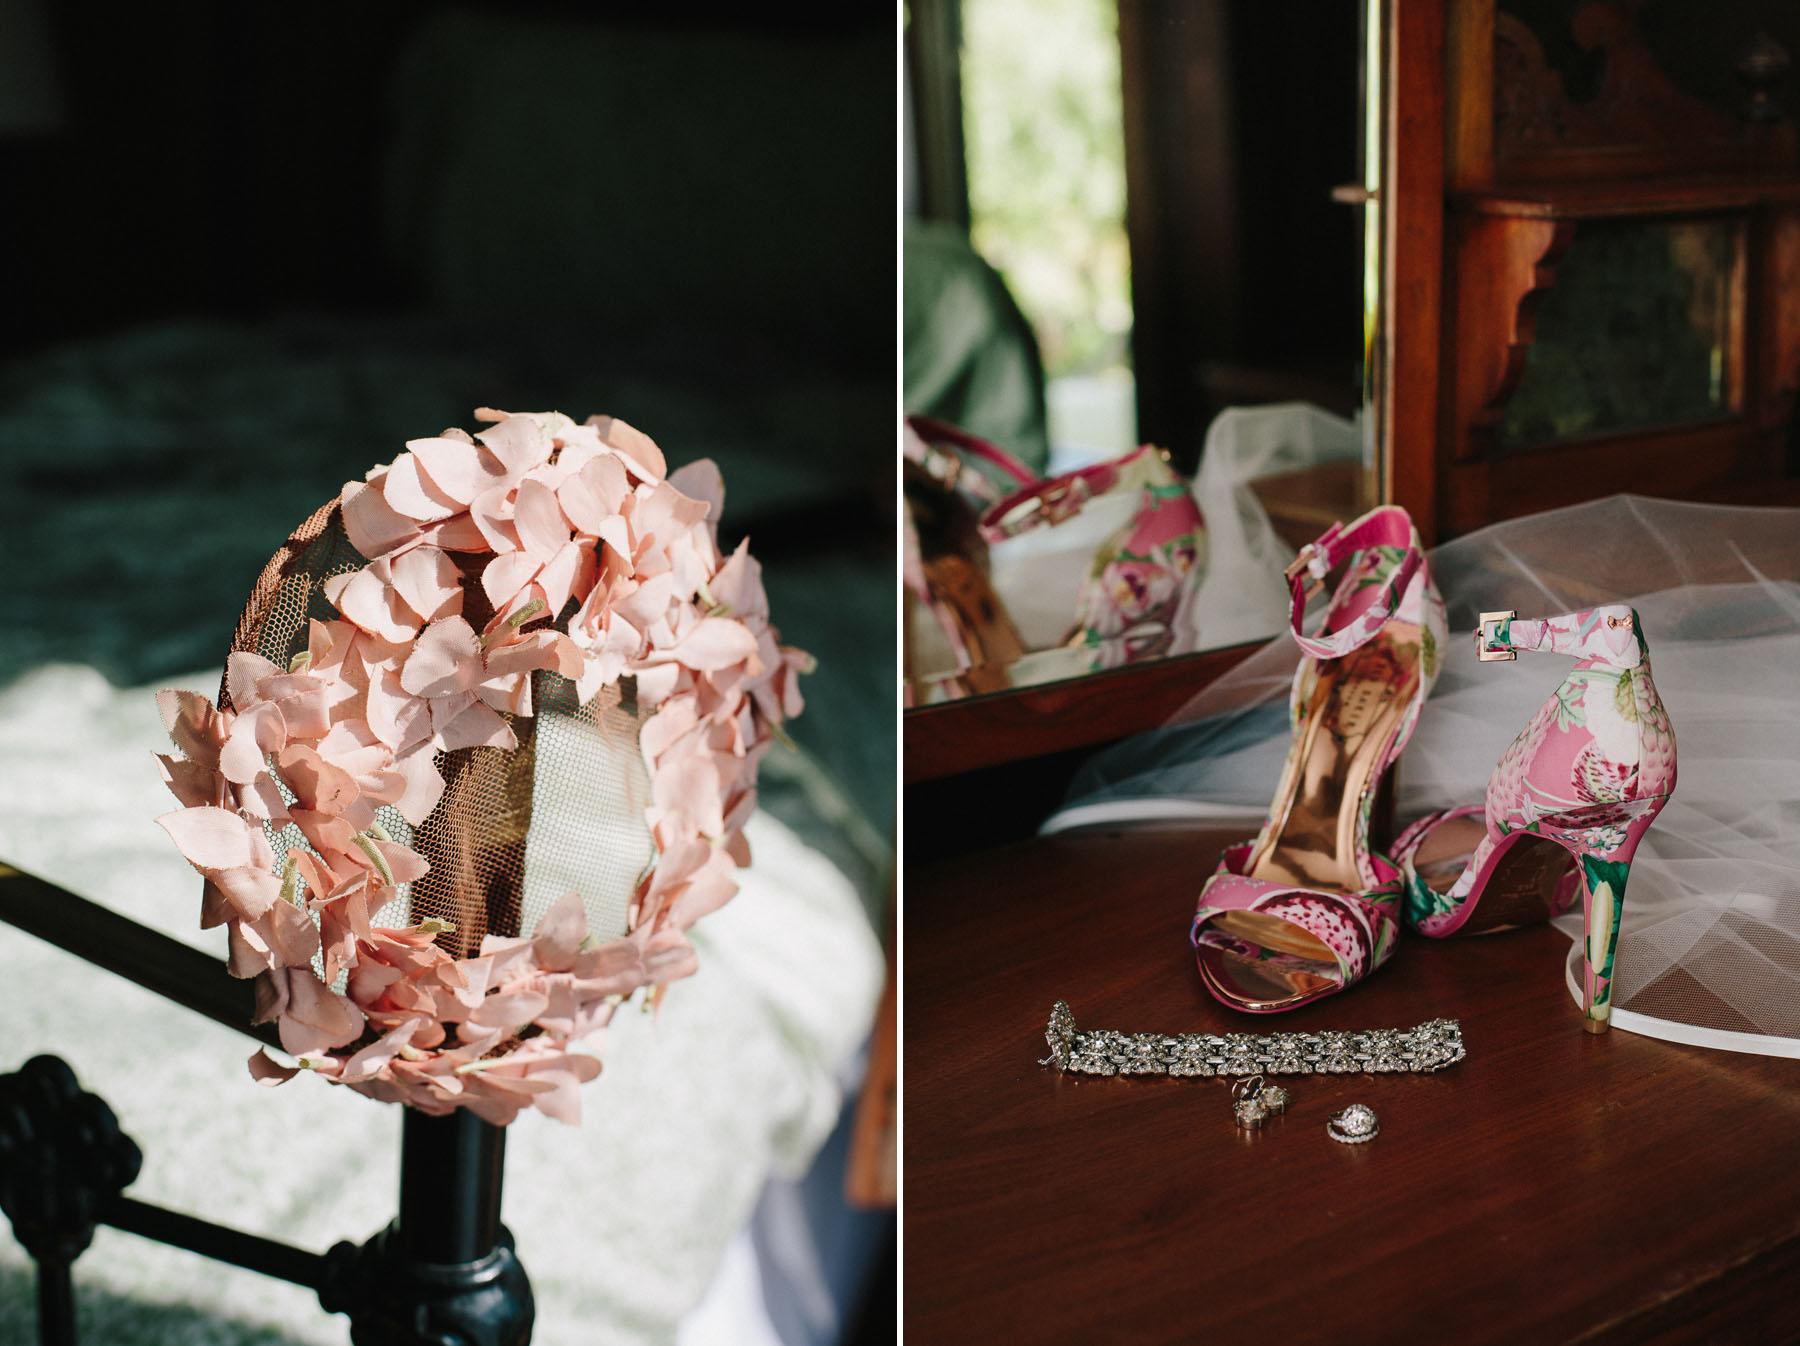 thetis-island-wedding-photographer-rp-rn-009.jpg